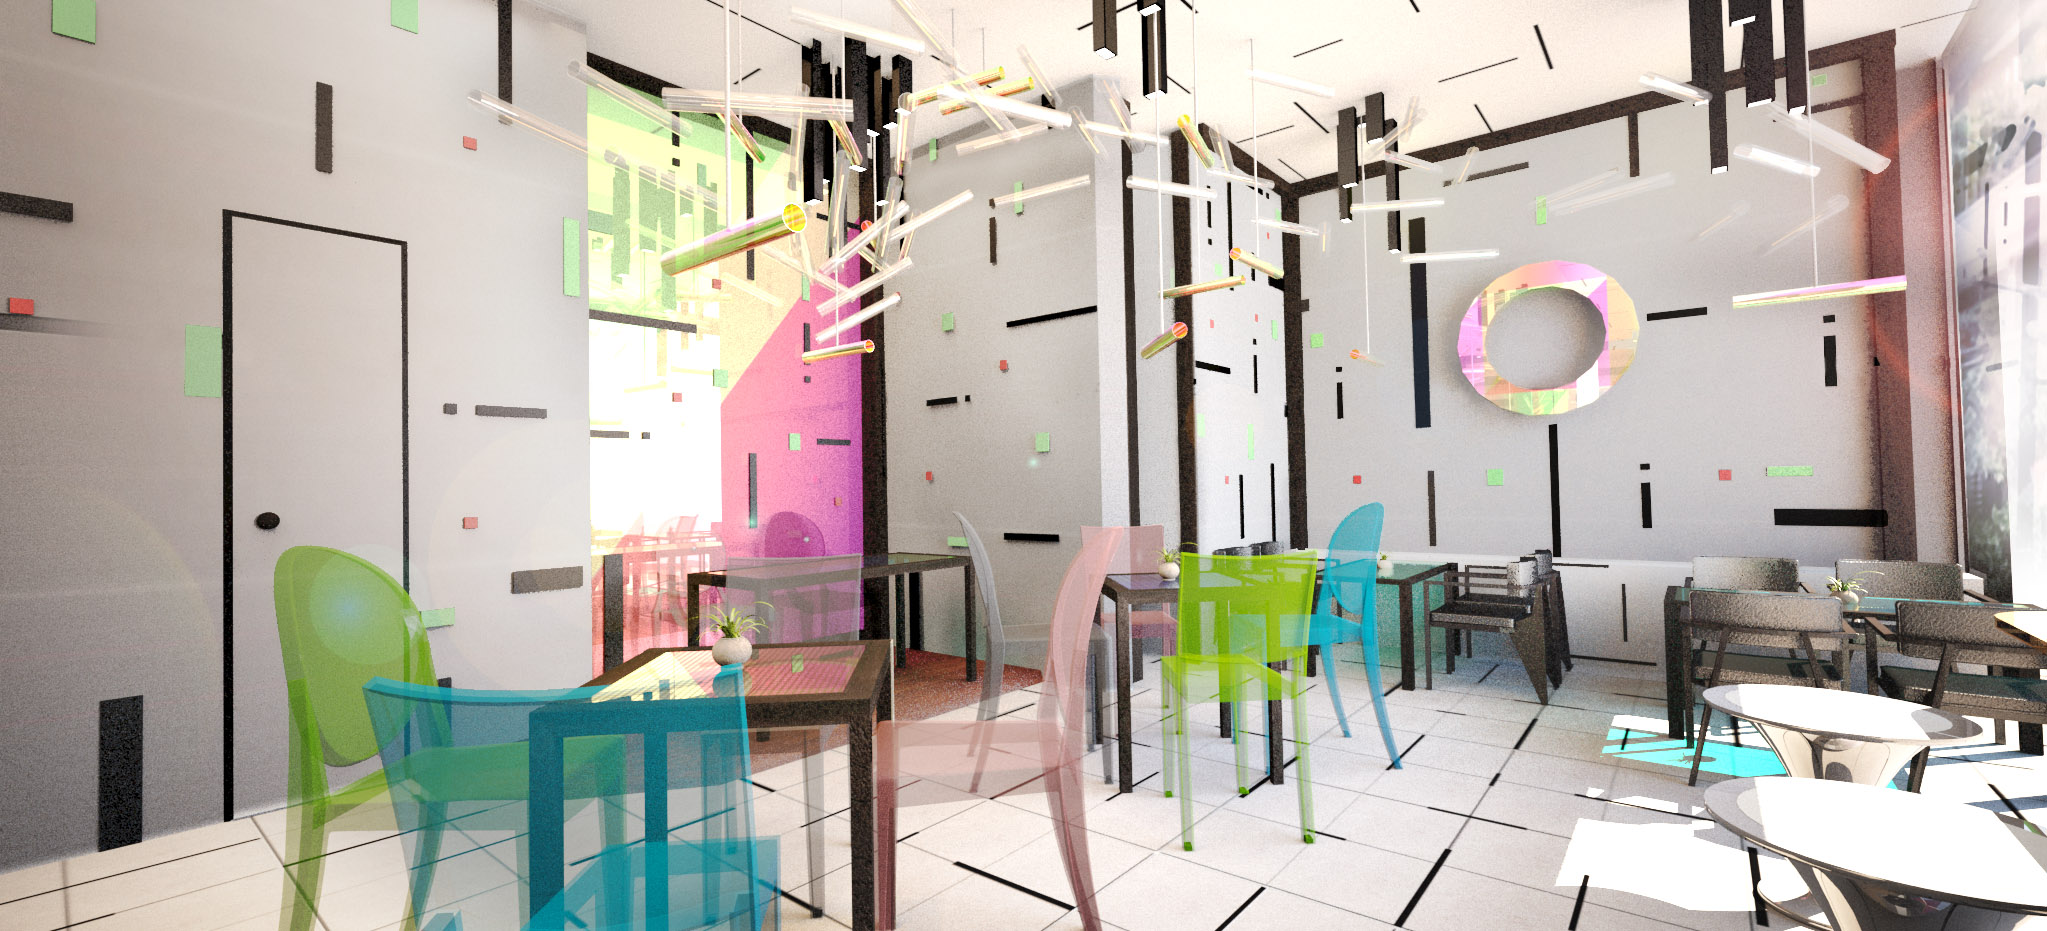 Quality Design Can Help Your Business Interior Design Built Graphic Design Branding Design